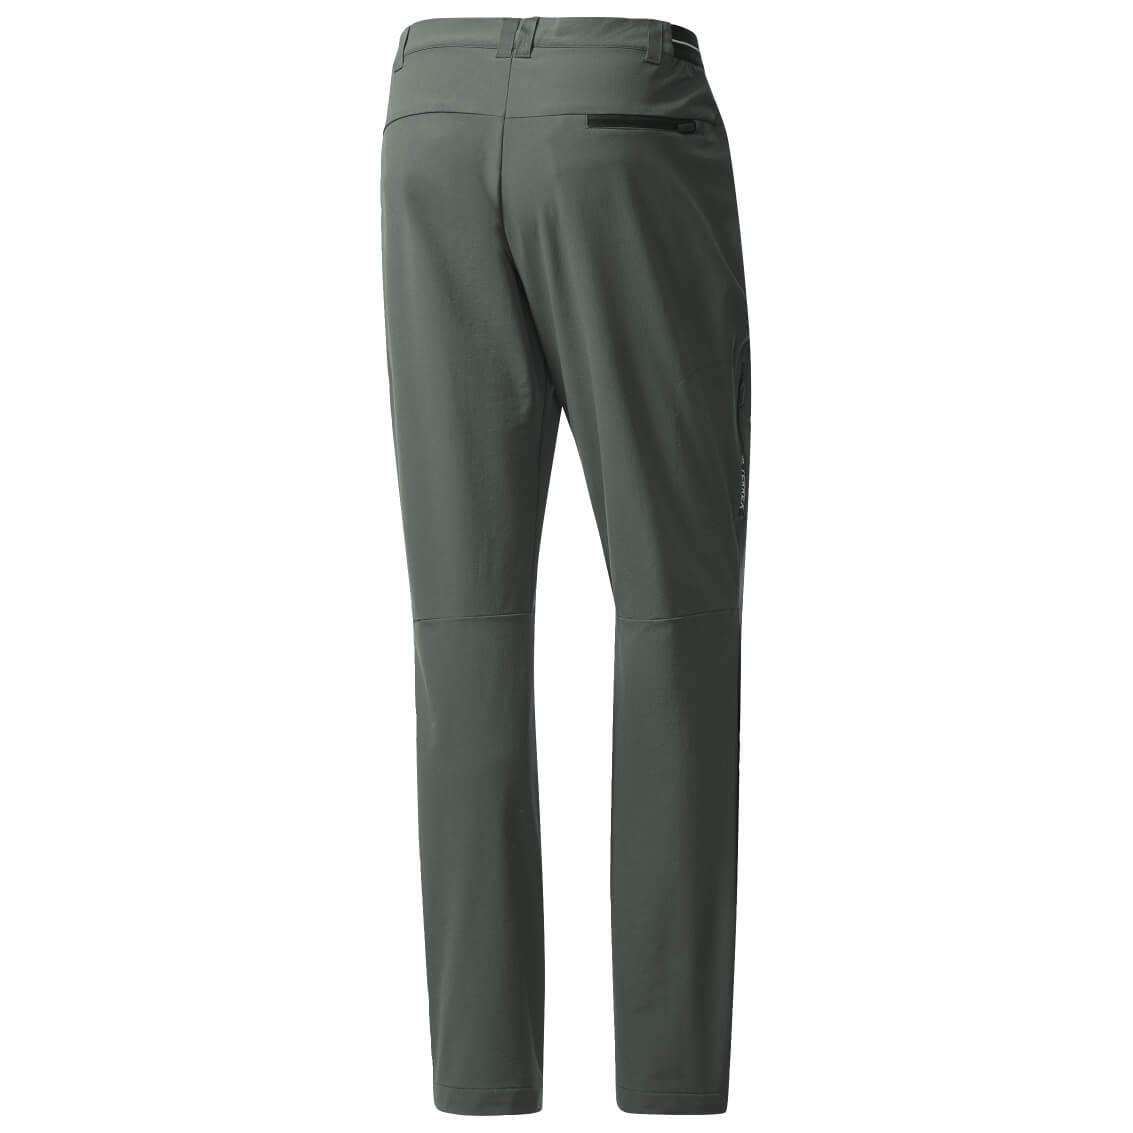 Allseason Pantaloni Terrex Pants Uomo Acquista Invernali Adidas 0fqx1gww